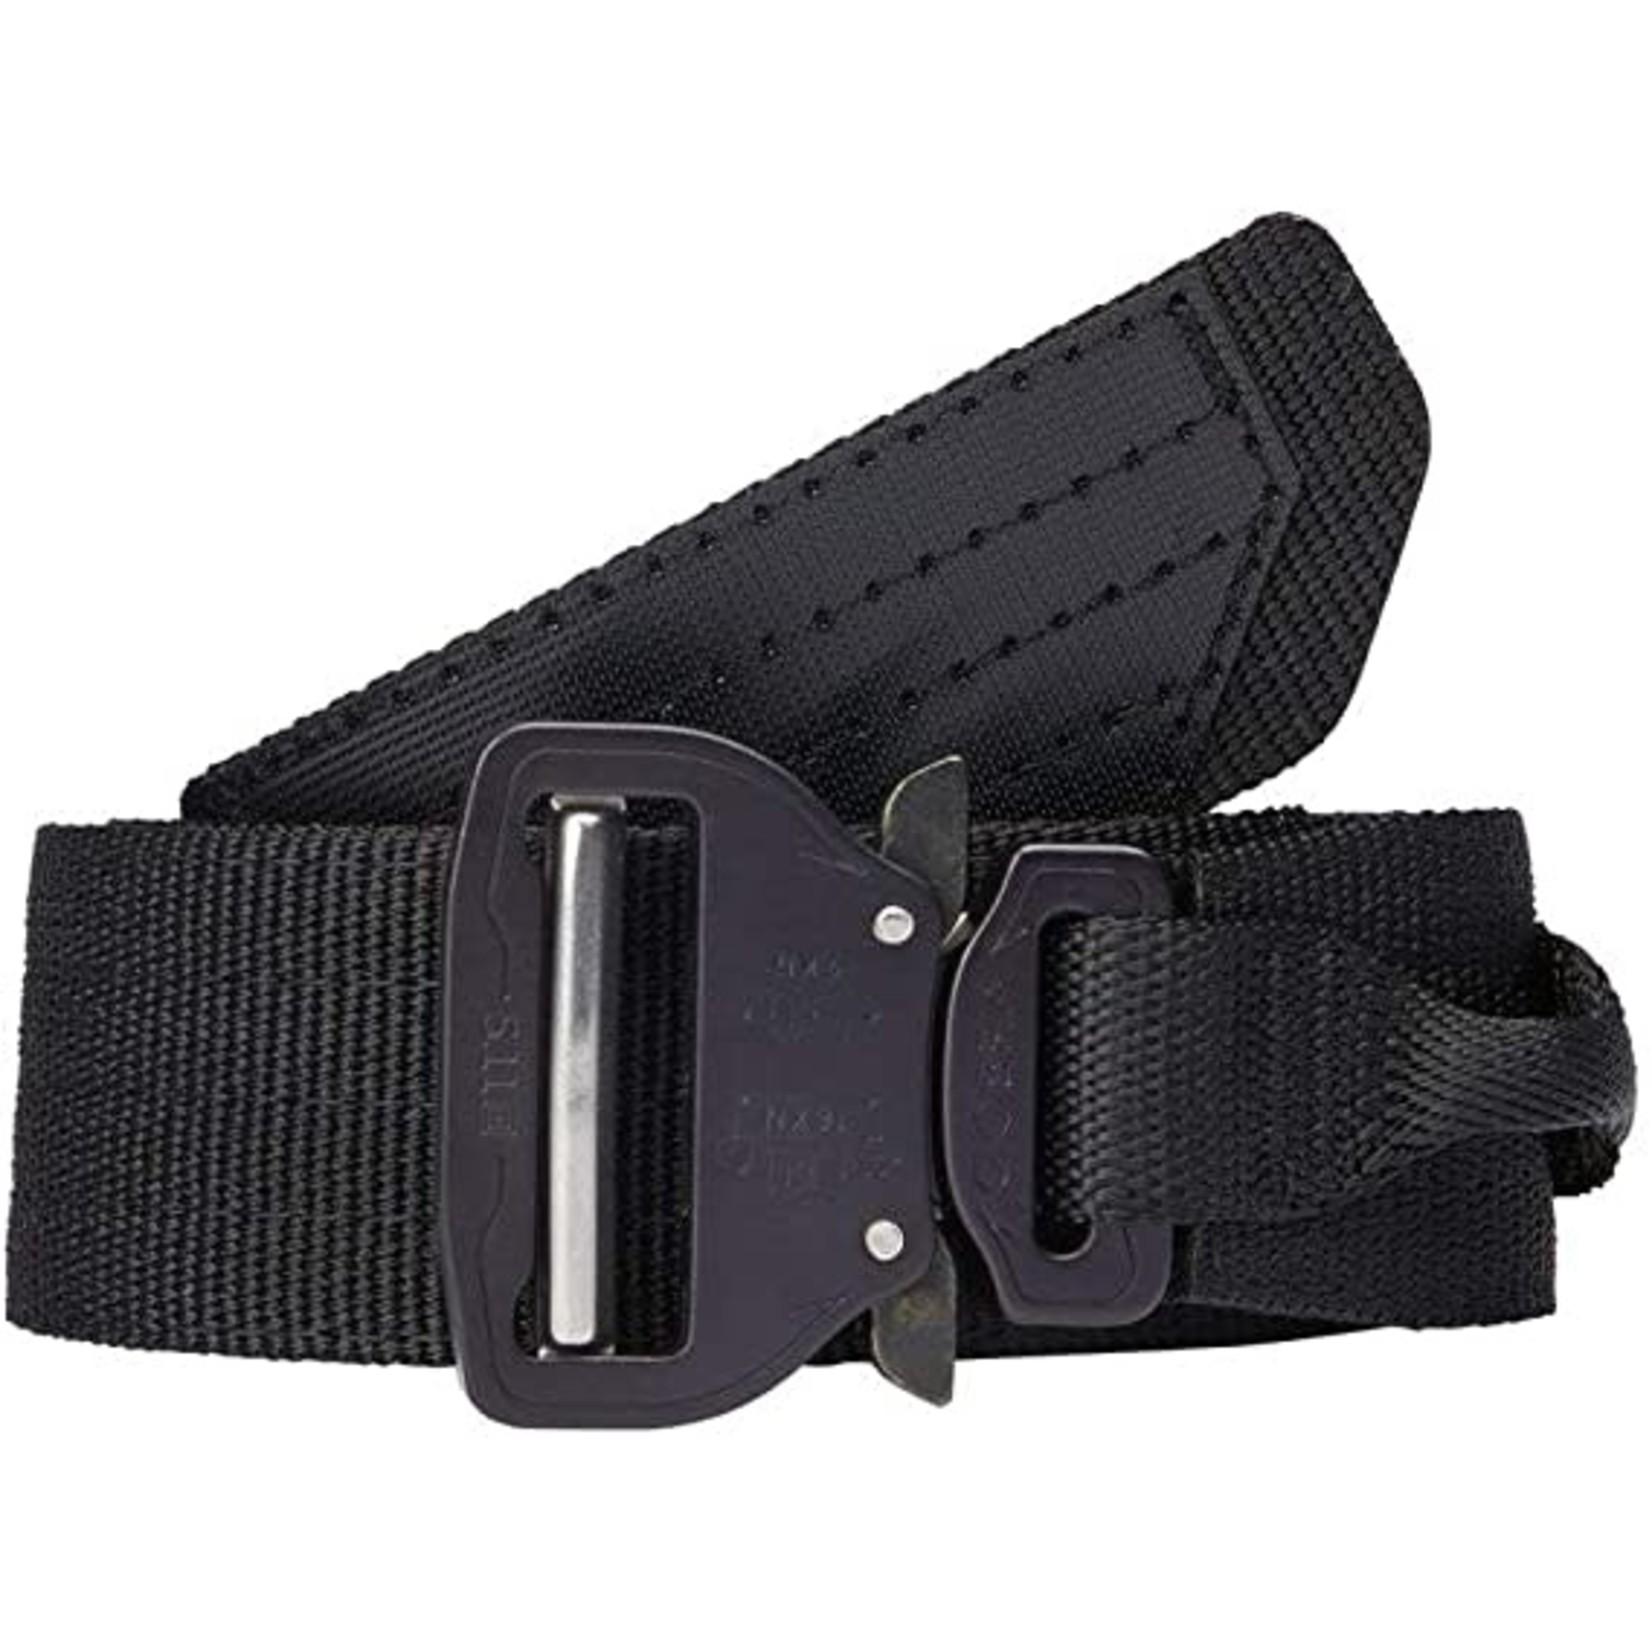 5.11 Tactical 5.11 Maverick Assaulter Belt (Riggers Belt)